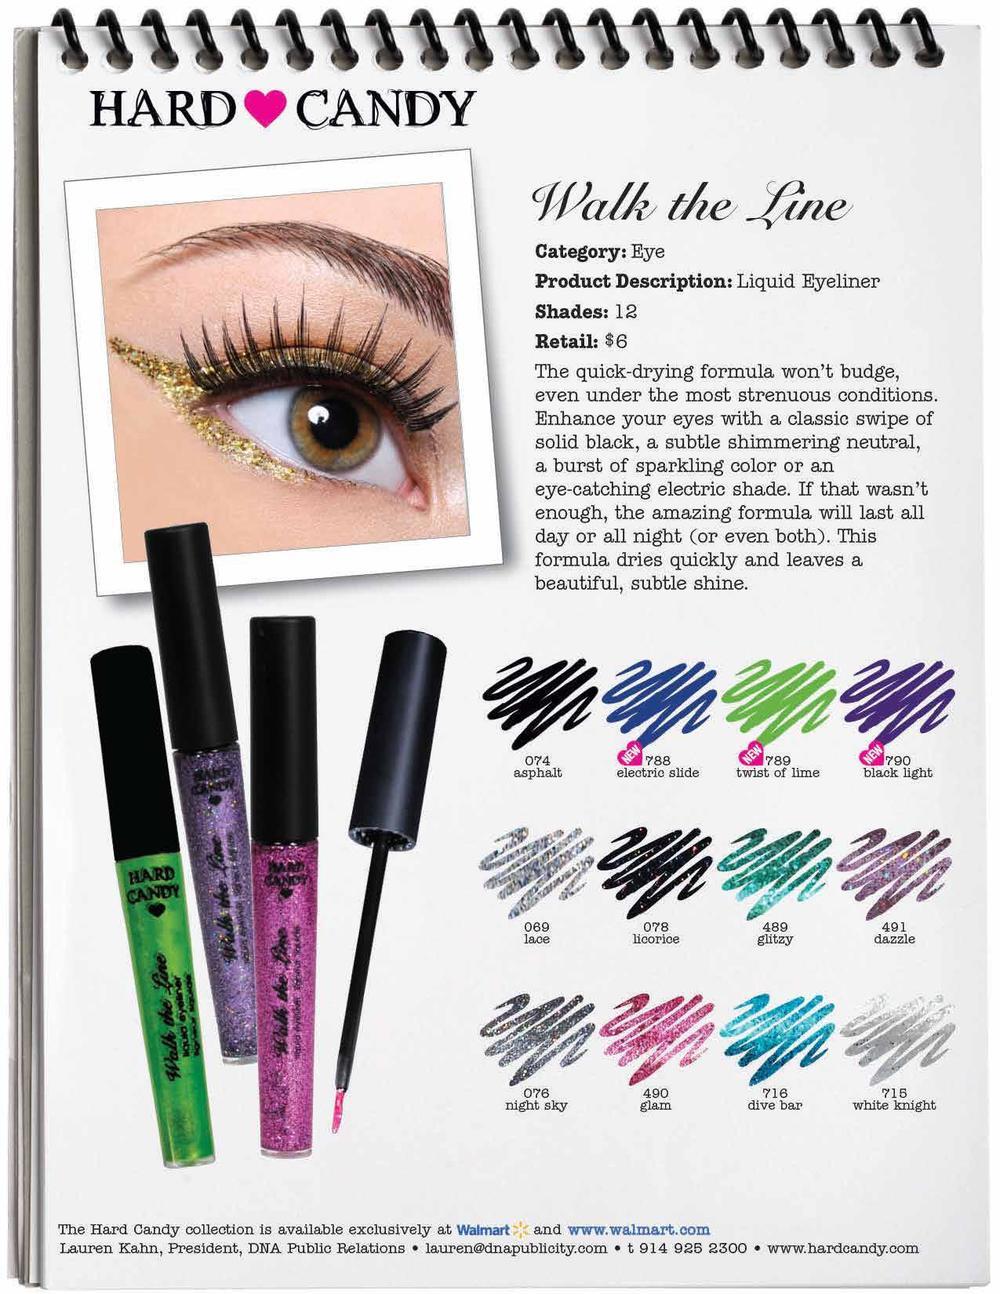 Eye candy makeup walmart